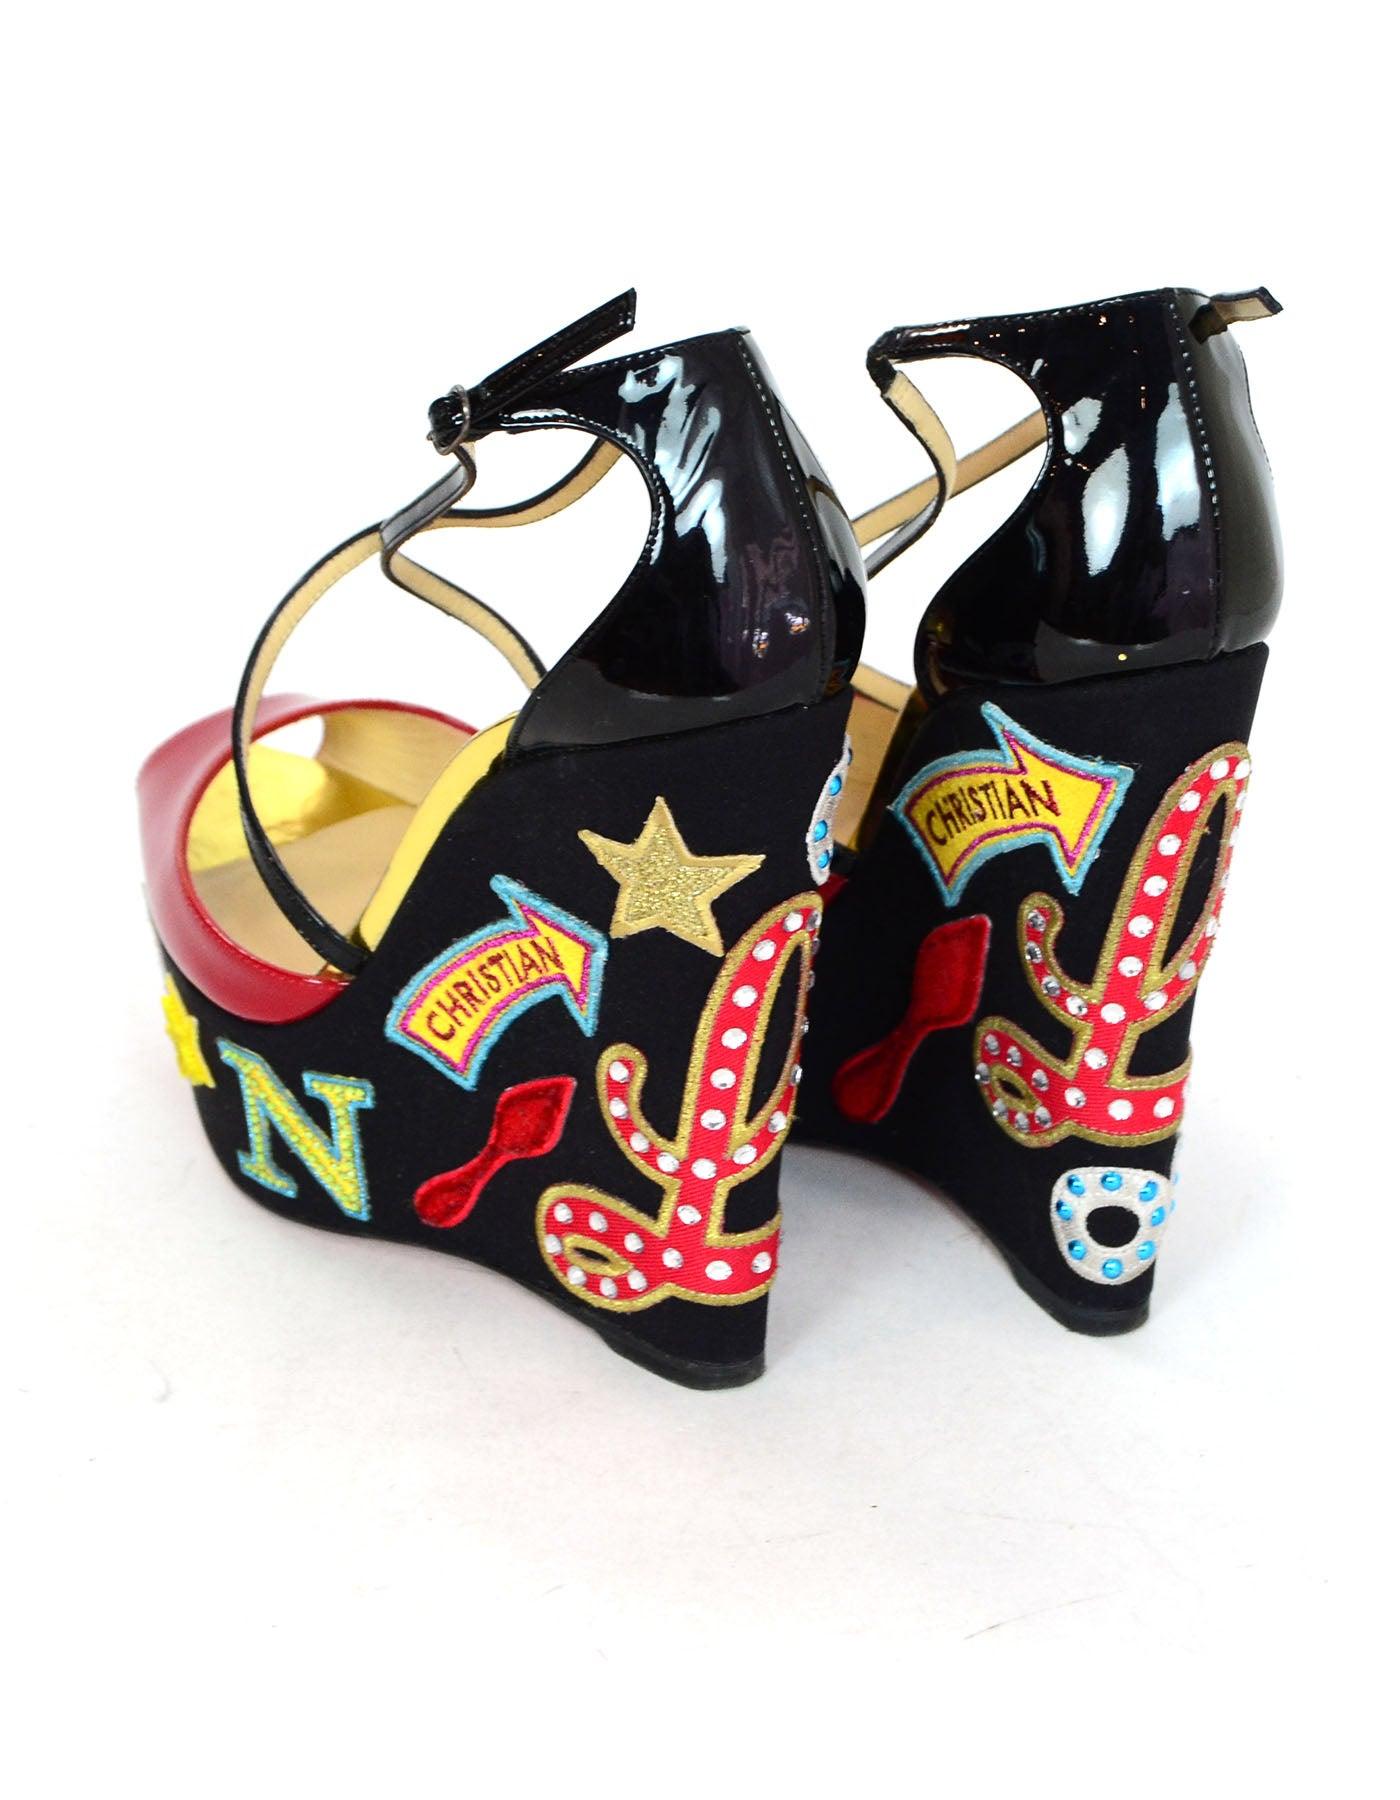 4b764ee278f greece christian louboutin loubi zeppa wedges heels 1416e c36b6